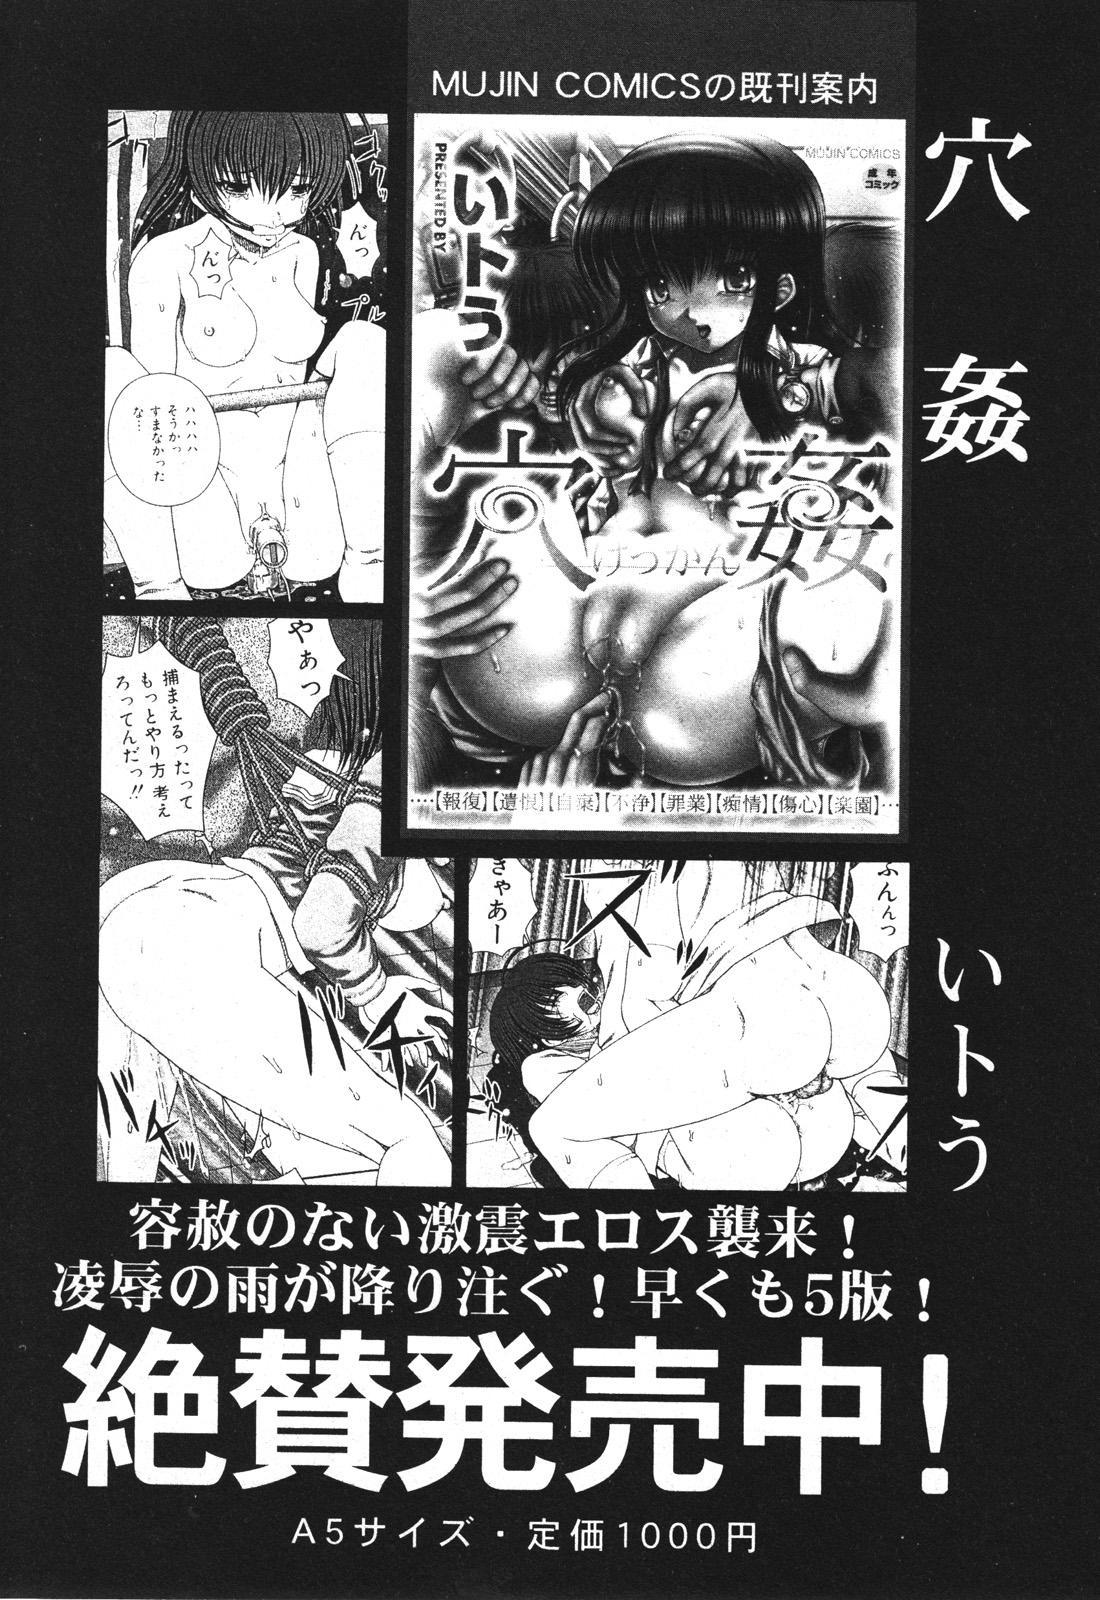 BUSTER COMIC 2010-05 Vol.07 191